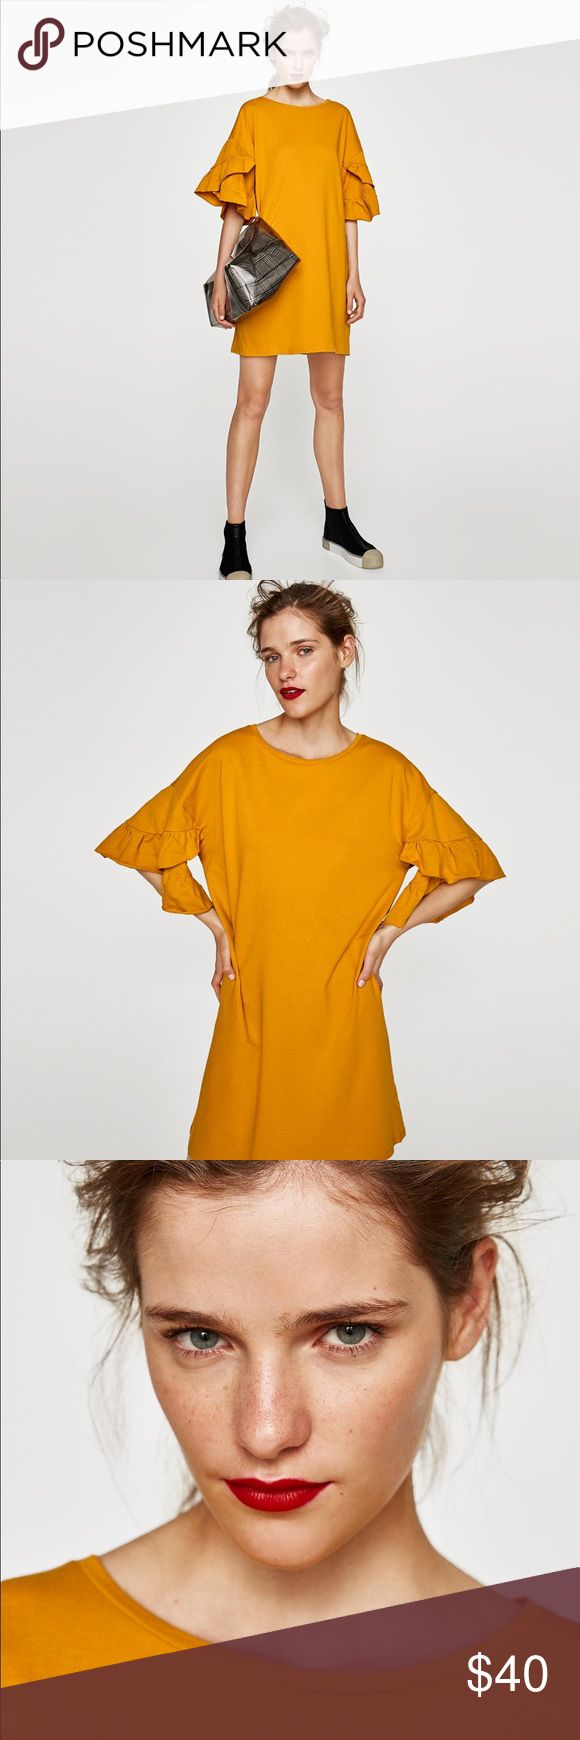 ZARA MUSTARD YELLOW DRESS W/ FRILLED SLEEVES Zara mustard yellow dress with frilled sleeves. Round neck. Short sleeves. Material feels like a very light sweatshirt. Brand new with tags. Zara Dresses Mini